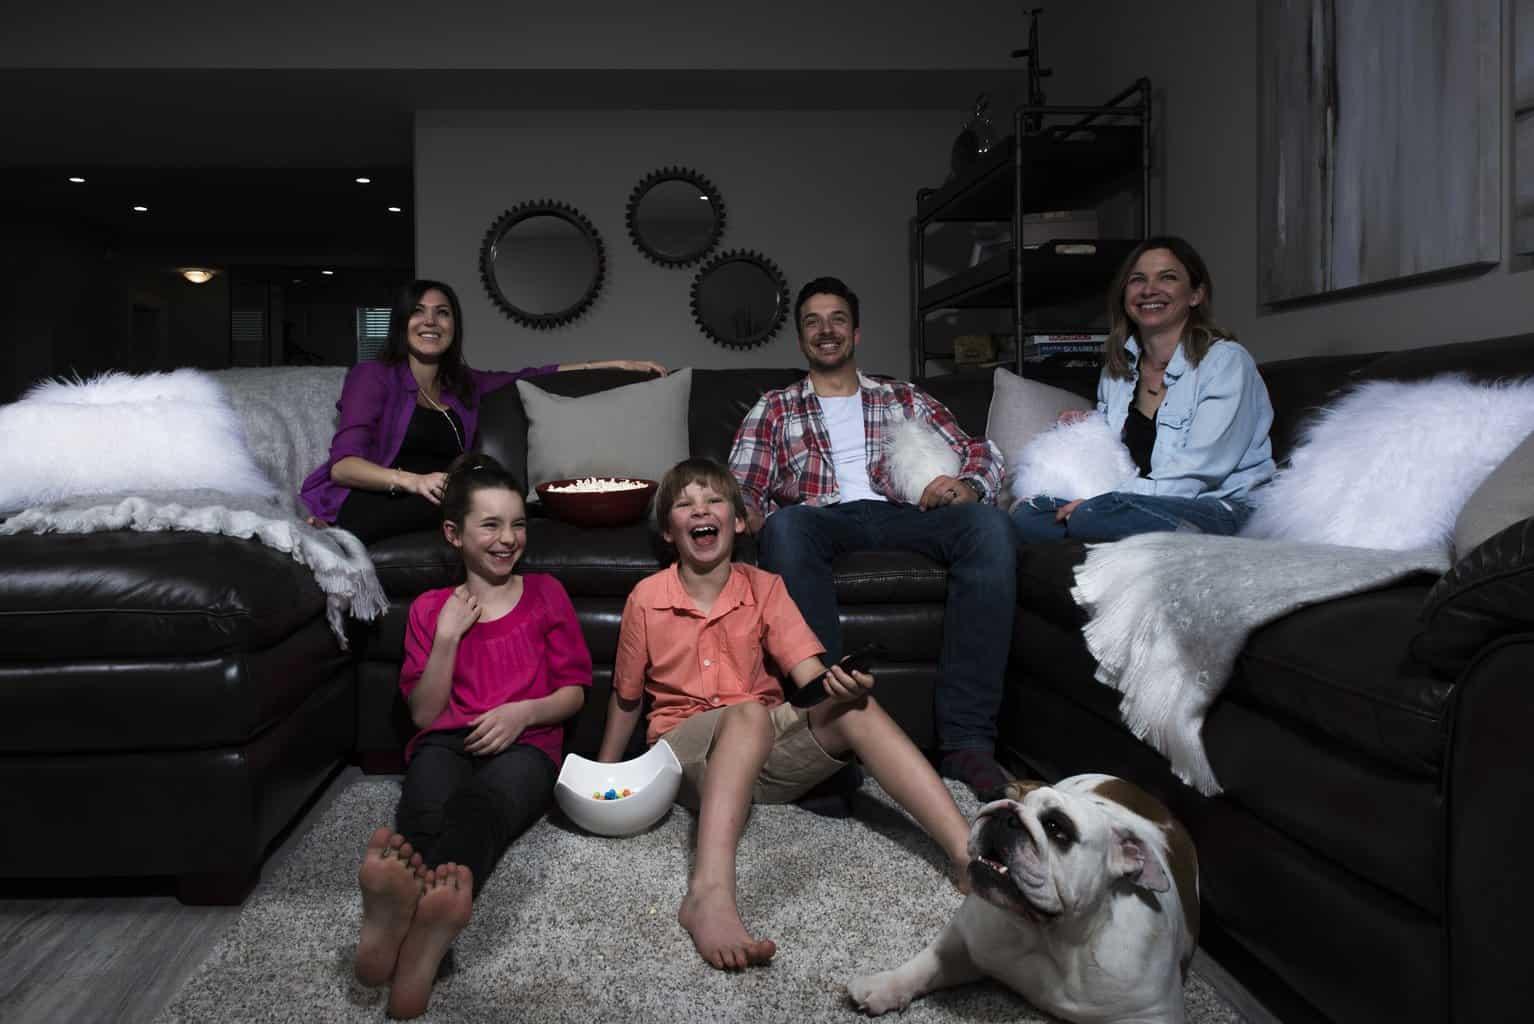 family enjoying a movie night